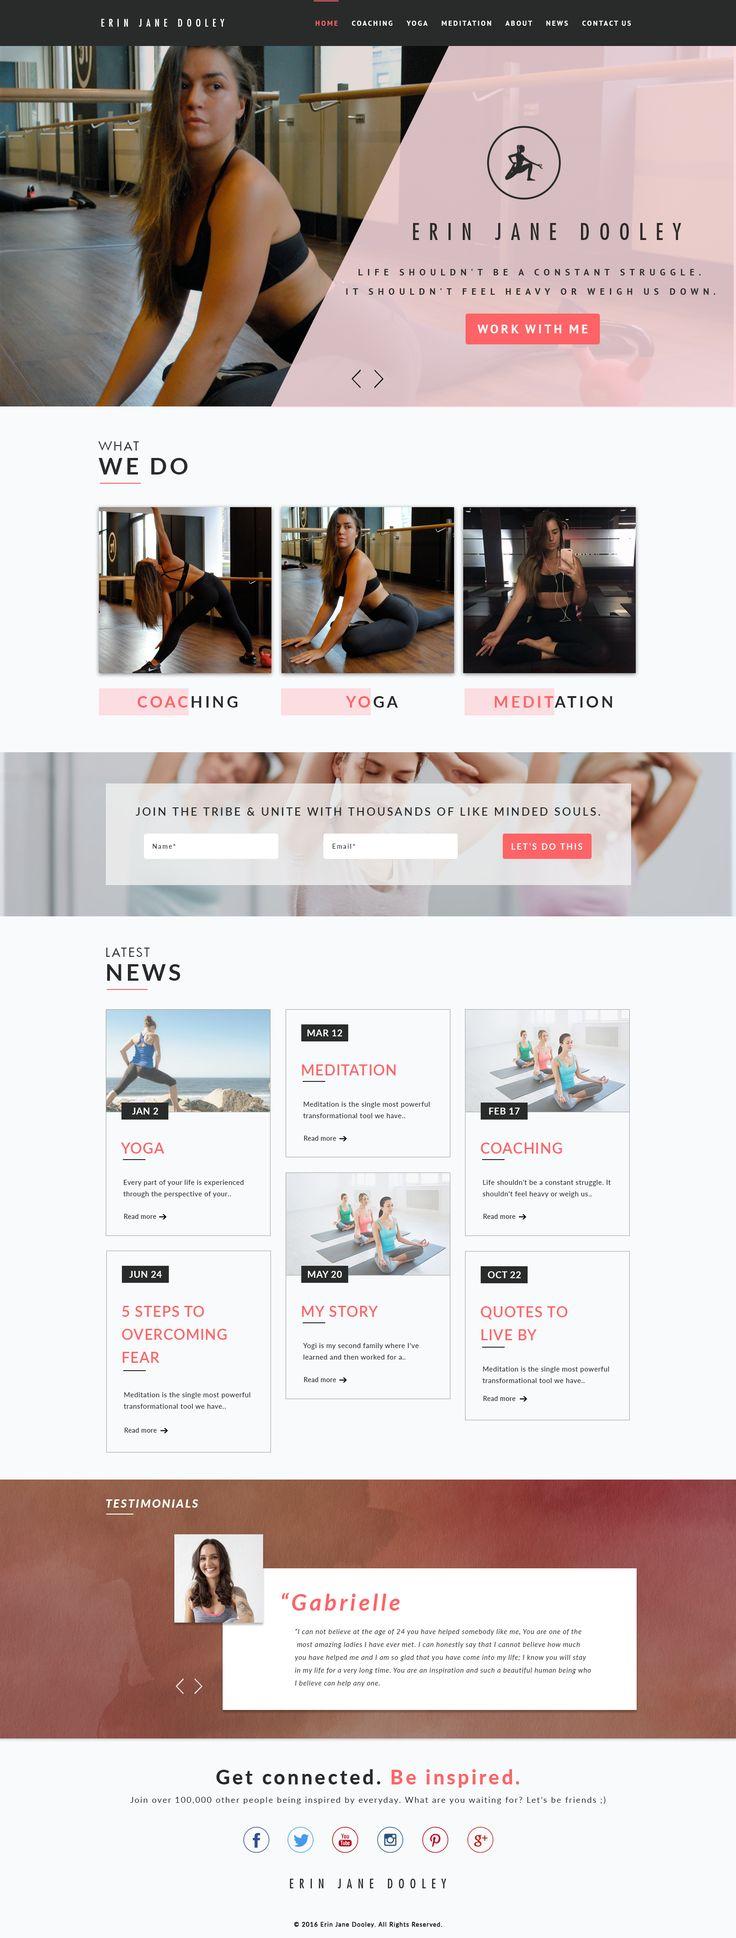 Erin jane dooley Yoga trainer Web Design